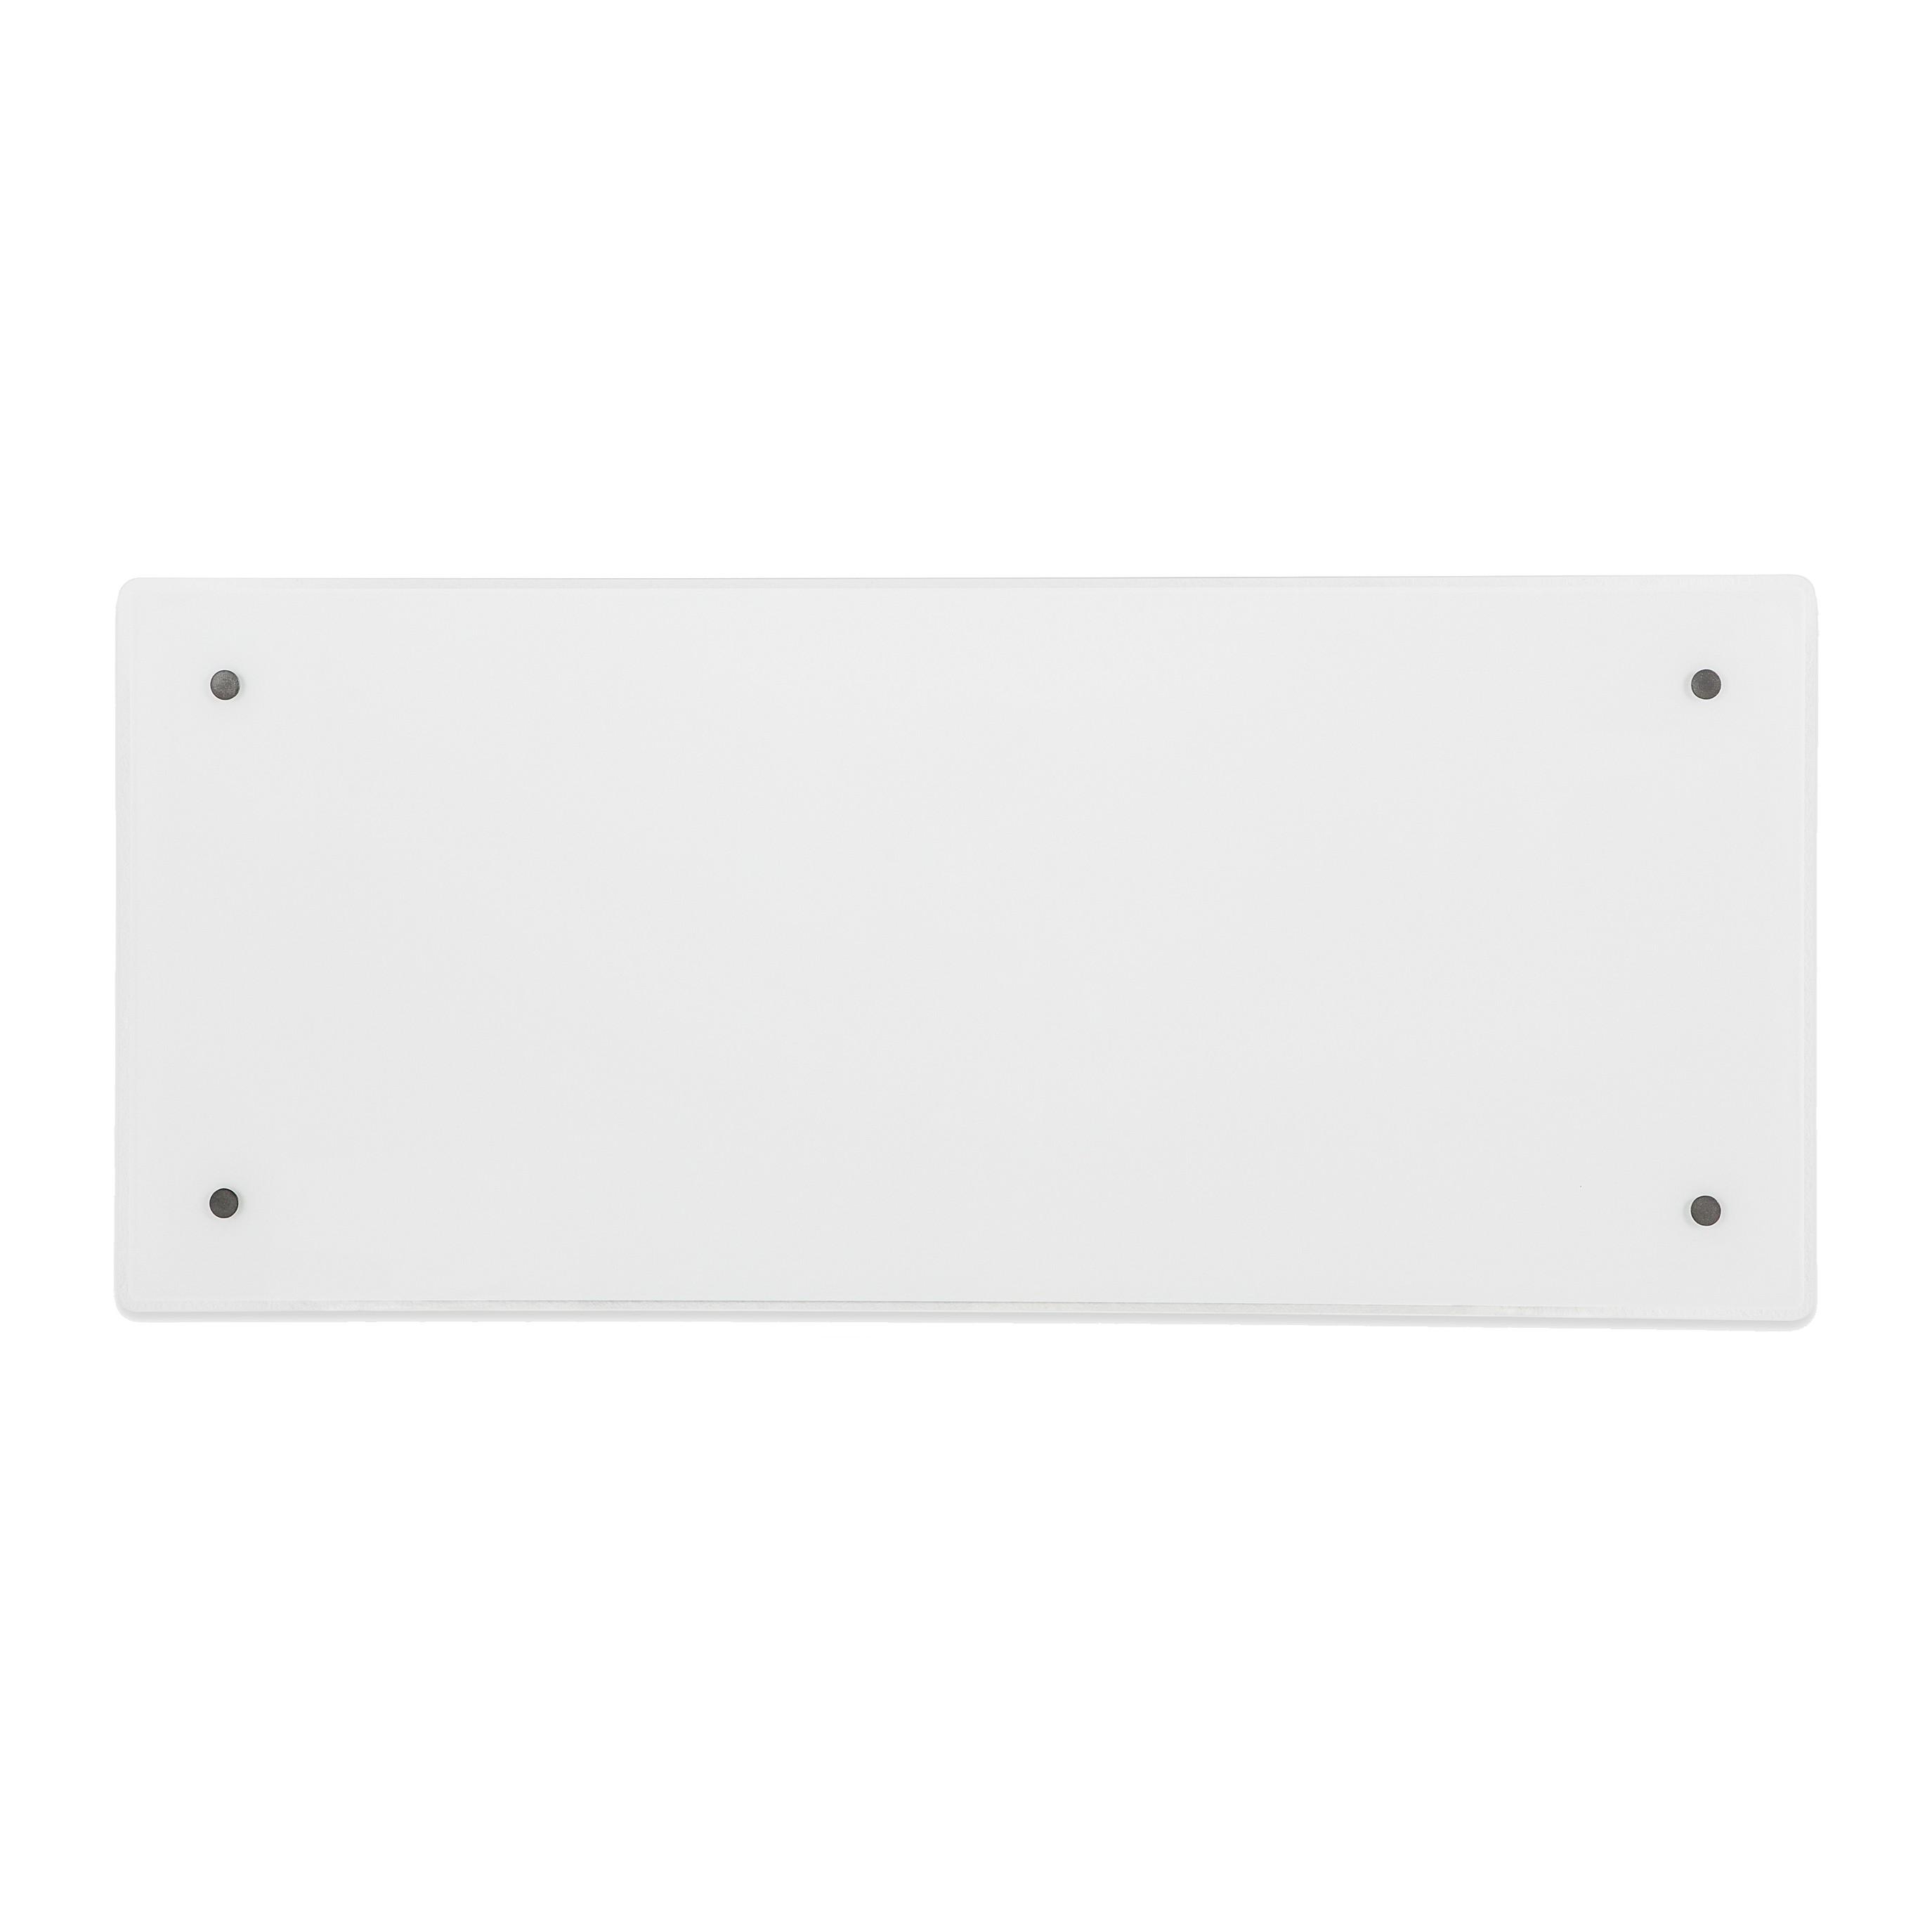 832401 : Adax Clea panelovn CP 10 KET